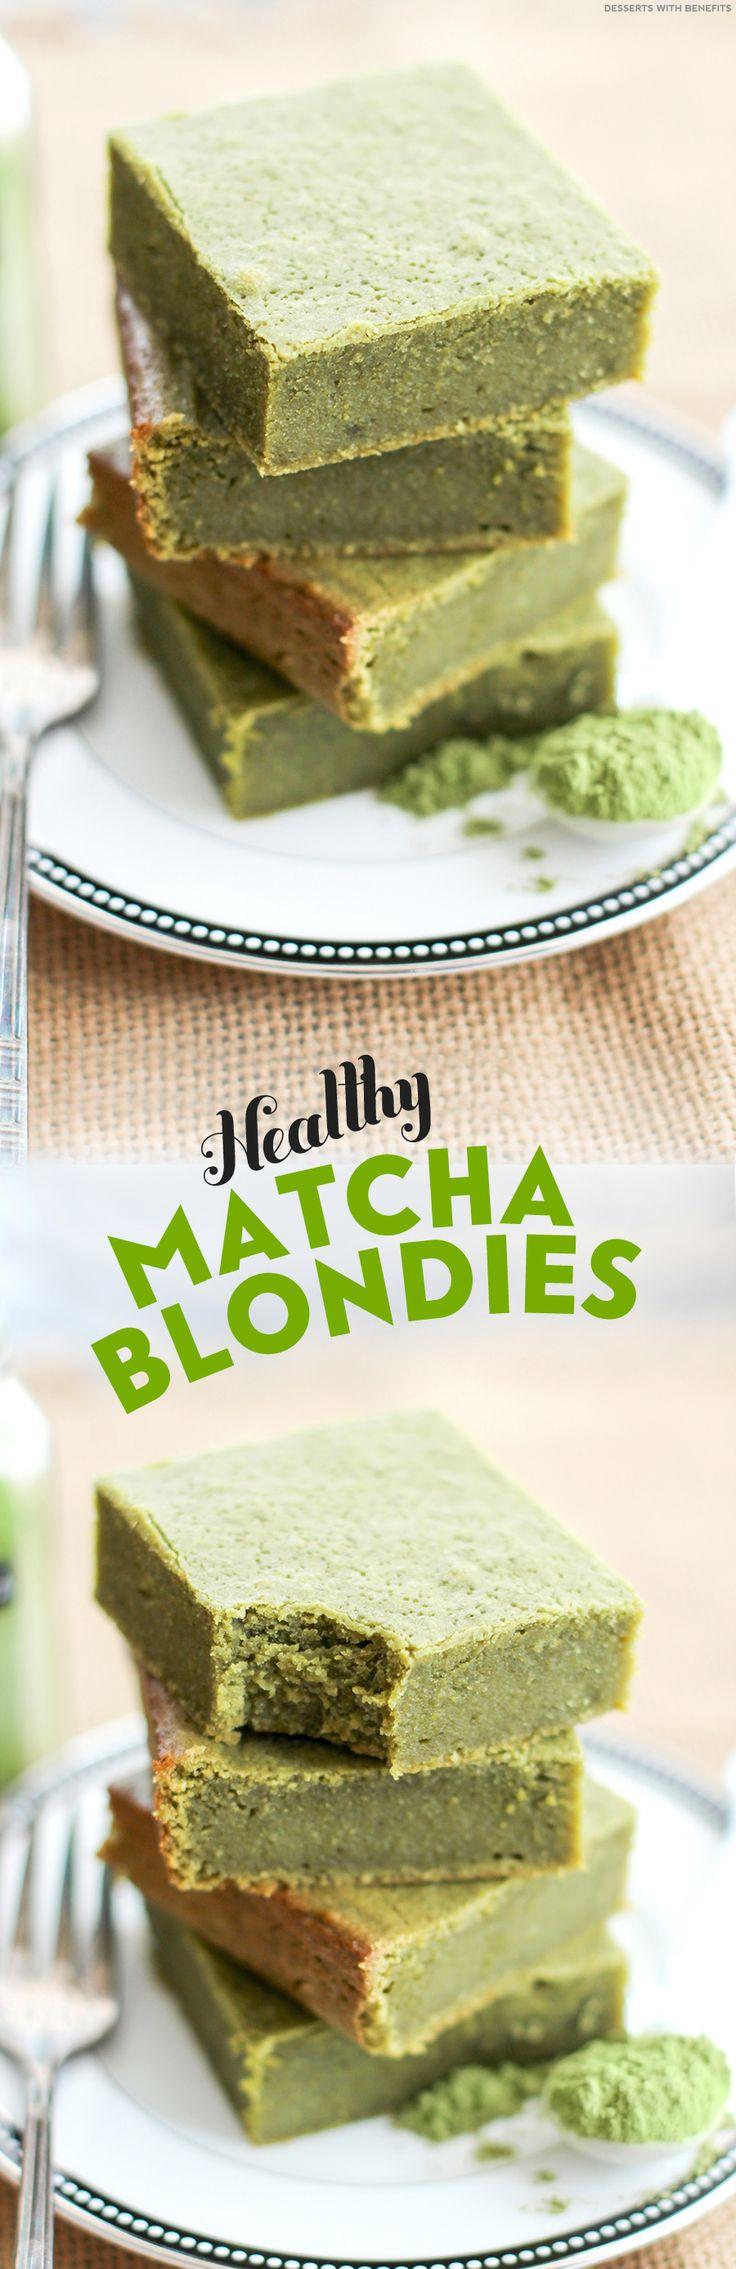 Healthy Matcha Green Tea Blondies (sugar free, high fiber, gluten free, vegan) - Healthy Dessert Recipes at Desserts with Benefits